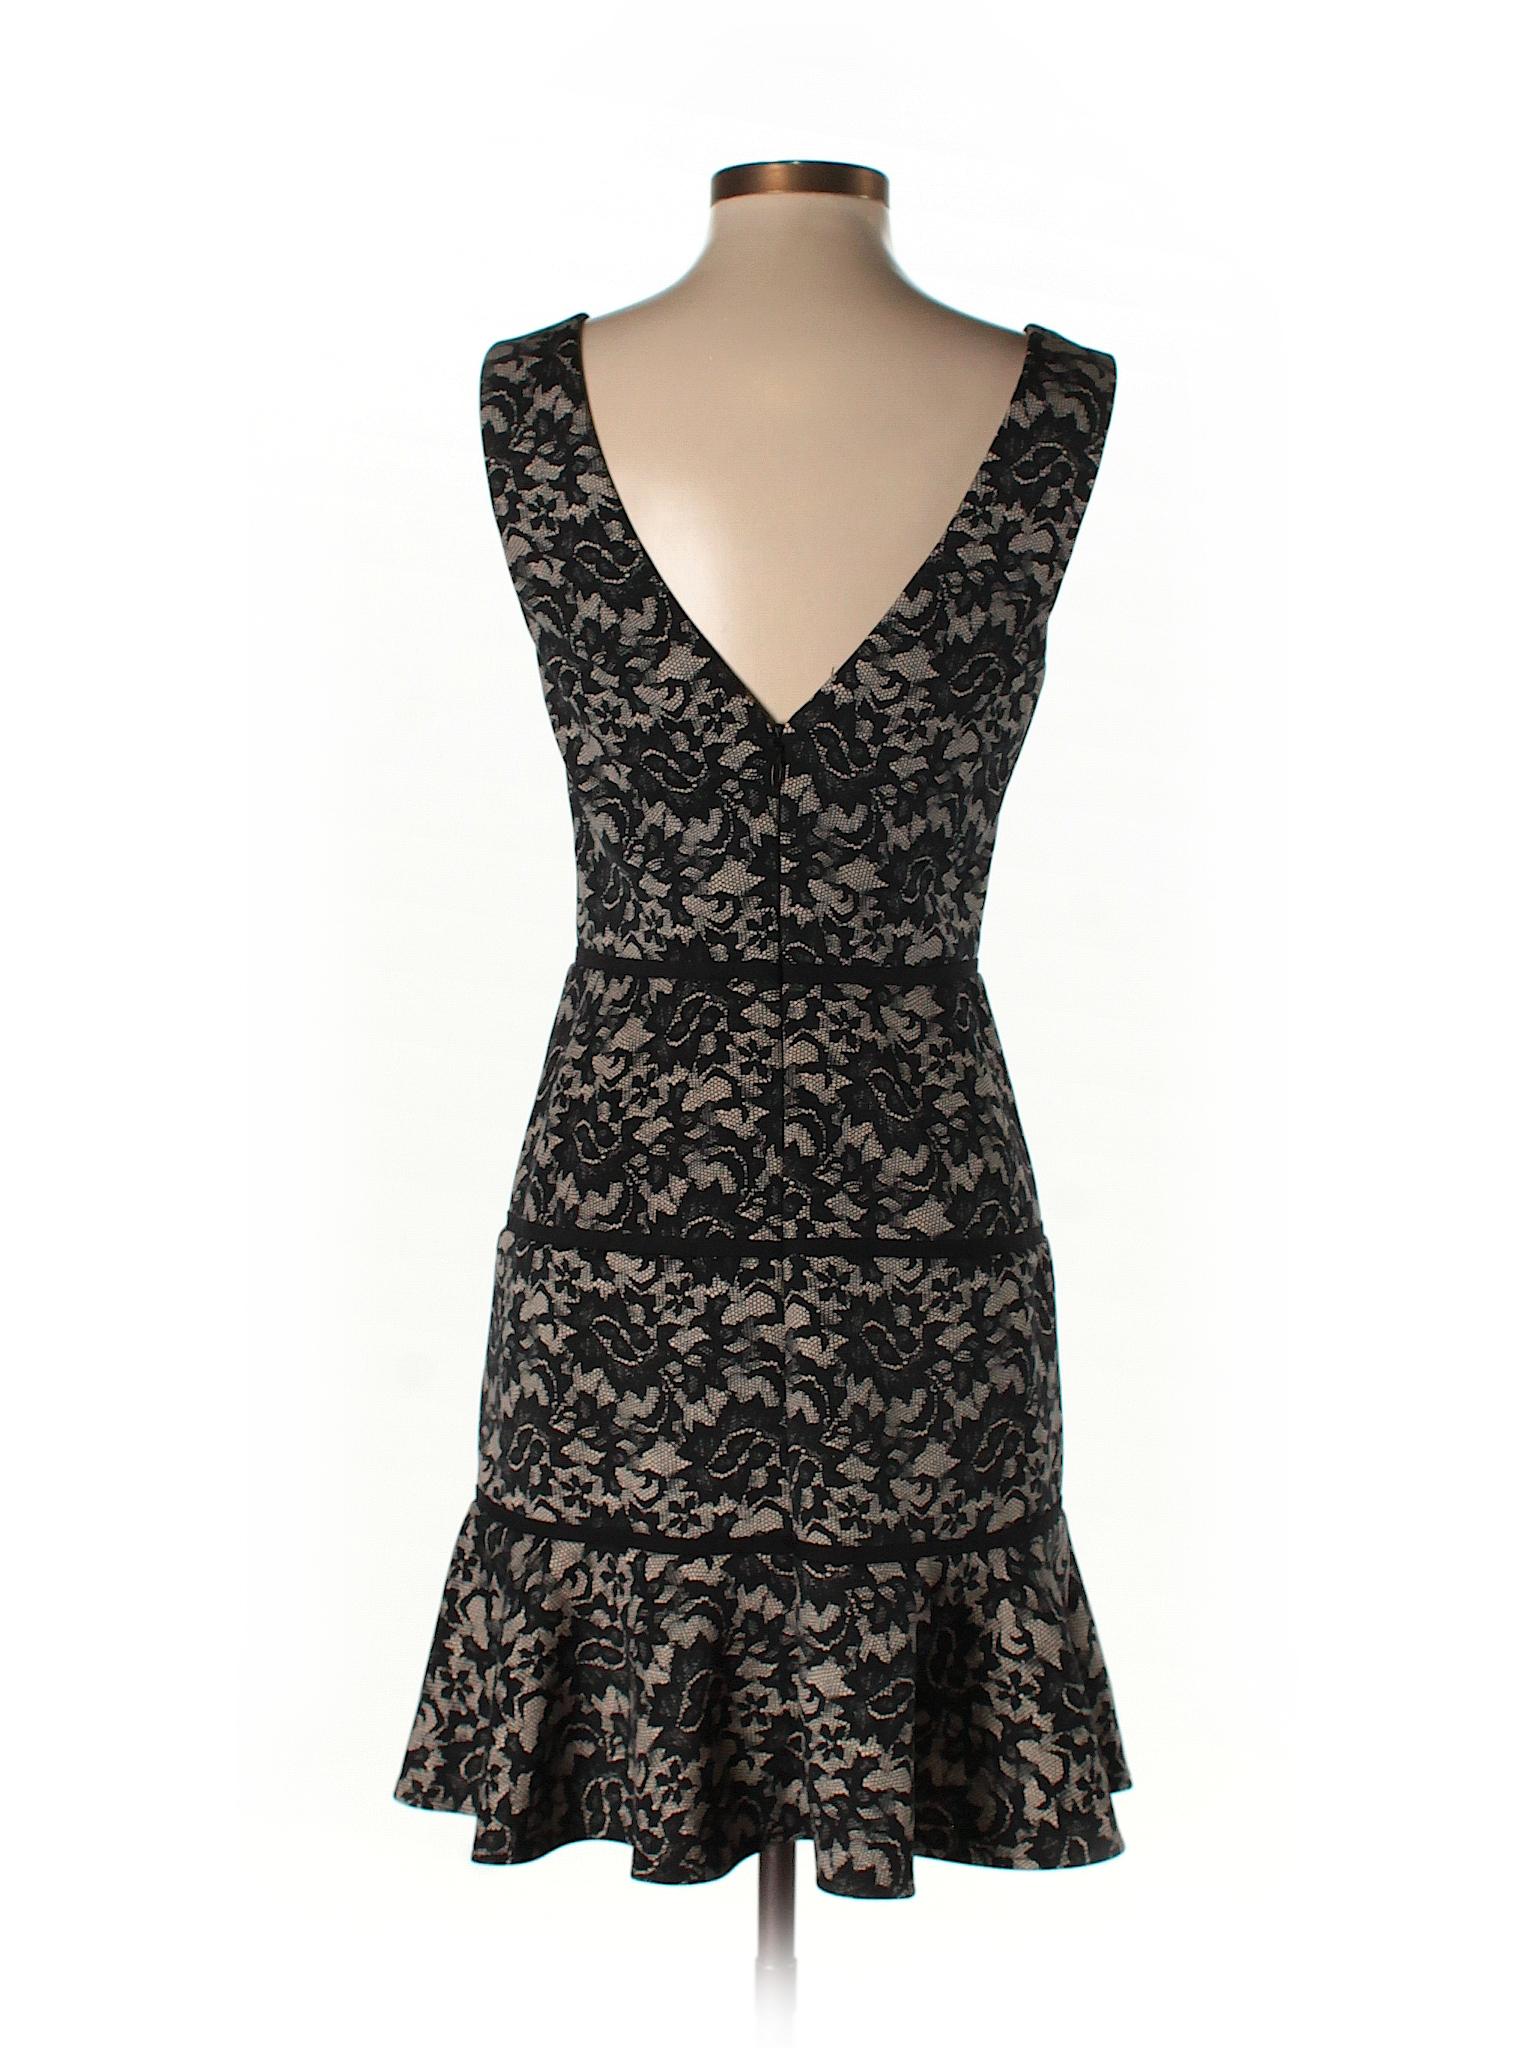 Casual winter Artelier Nicole Miller Boutique Dress 1qOIPn61w